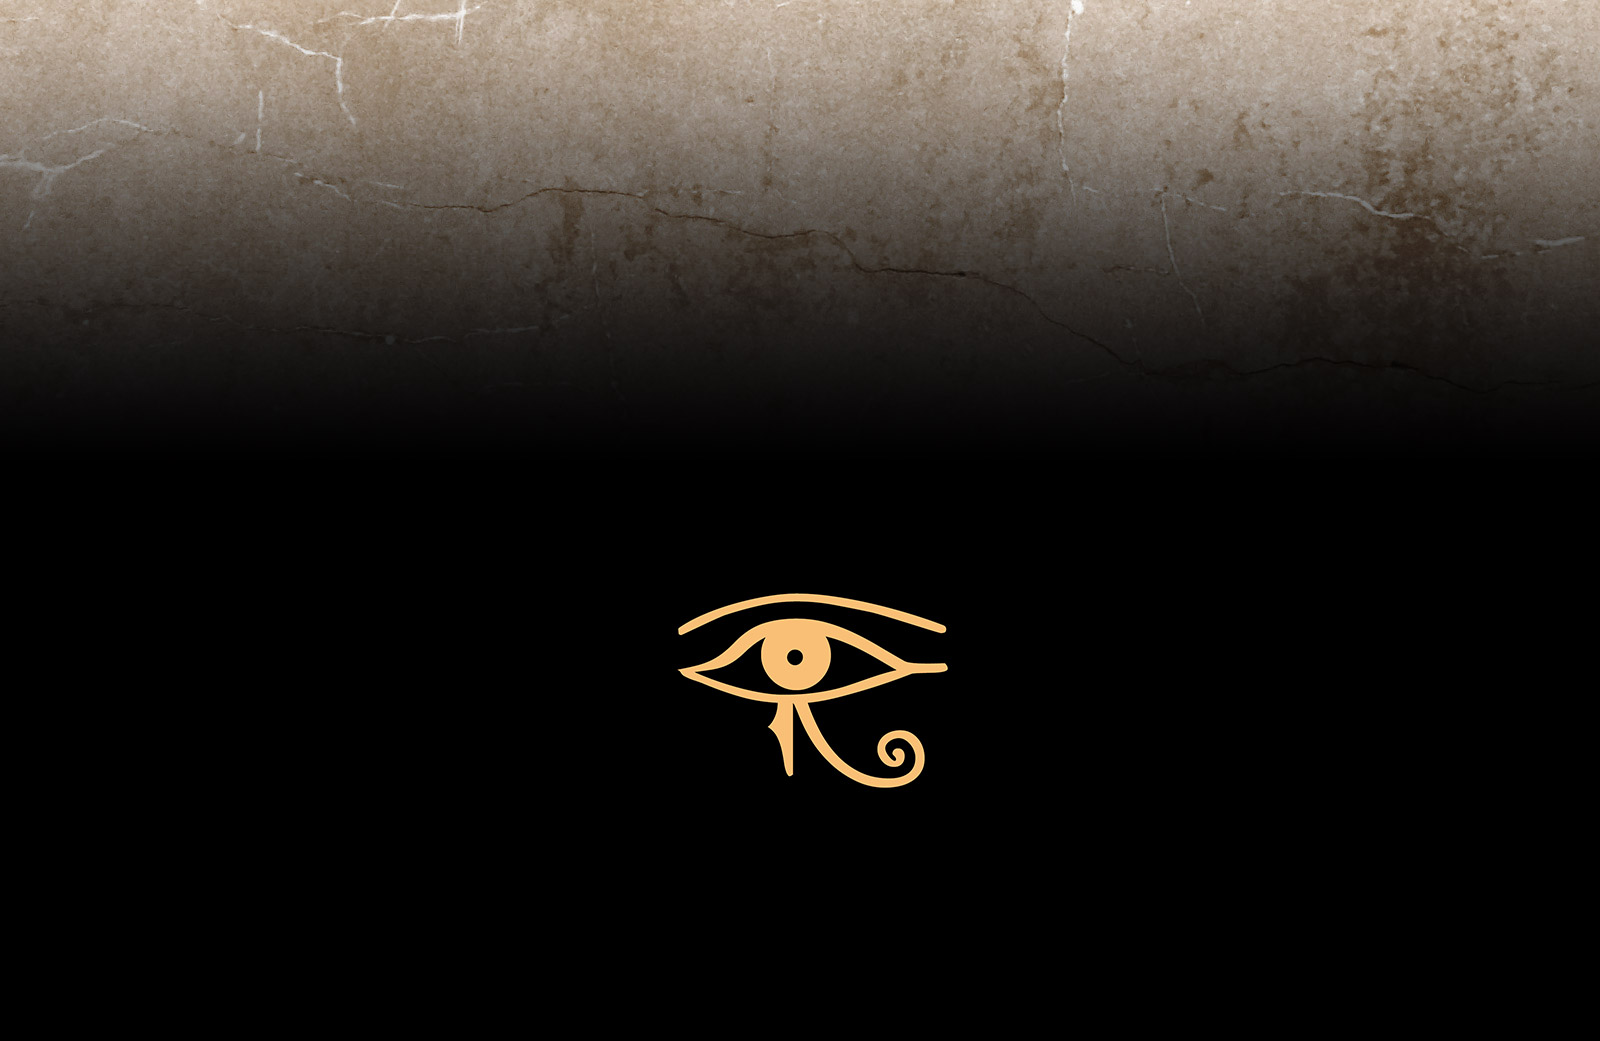 esLebeDerKoenig_hieroglyphe_ending